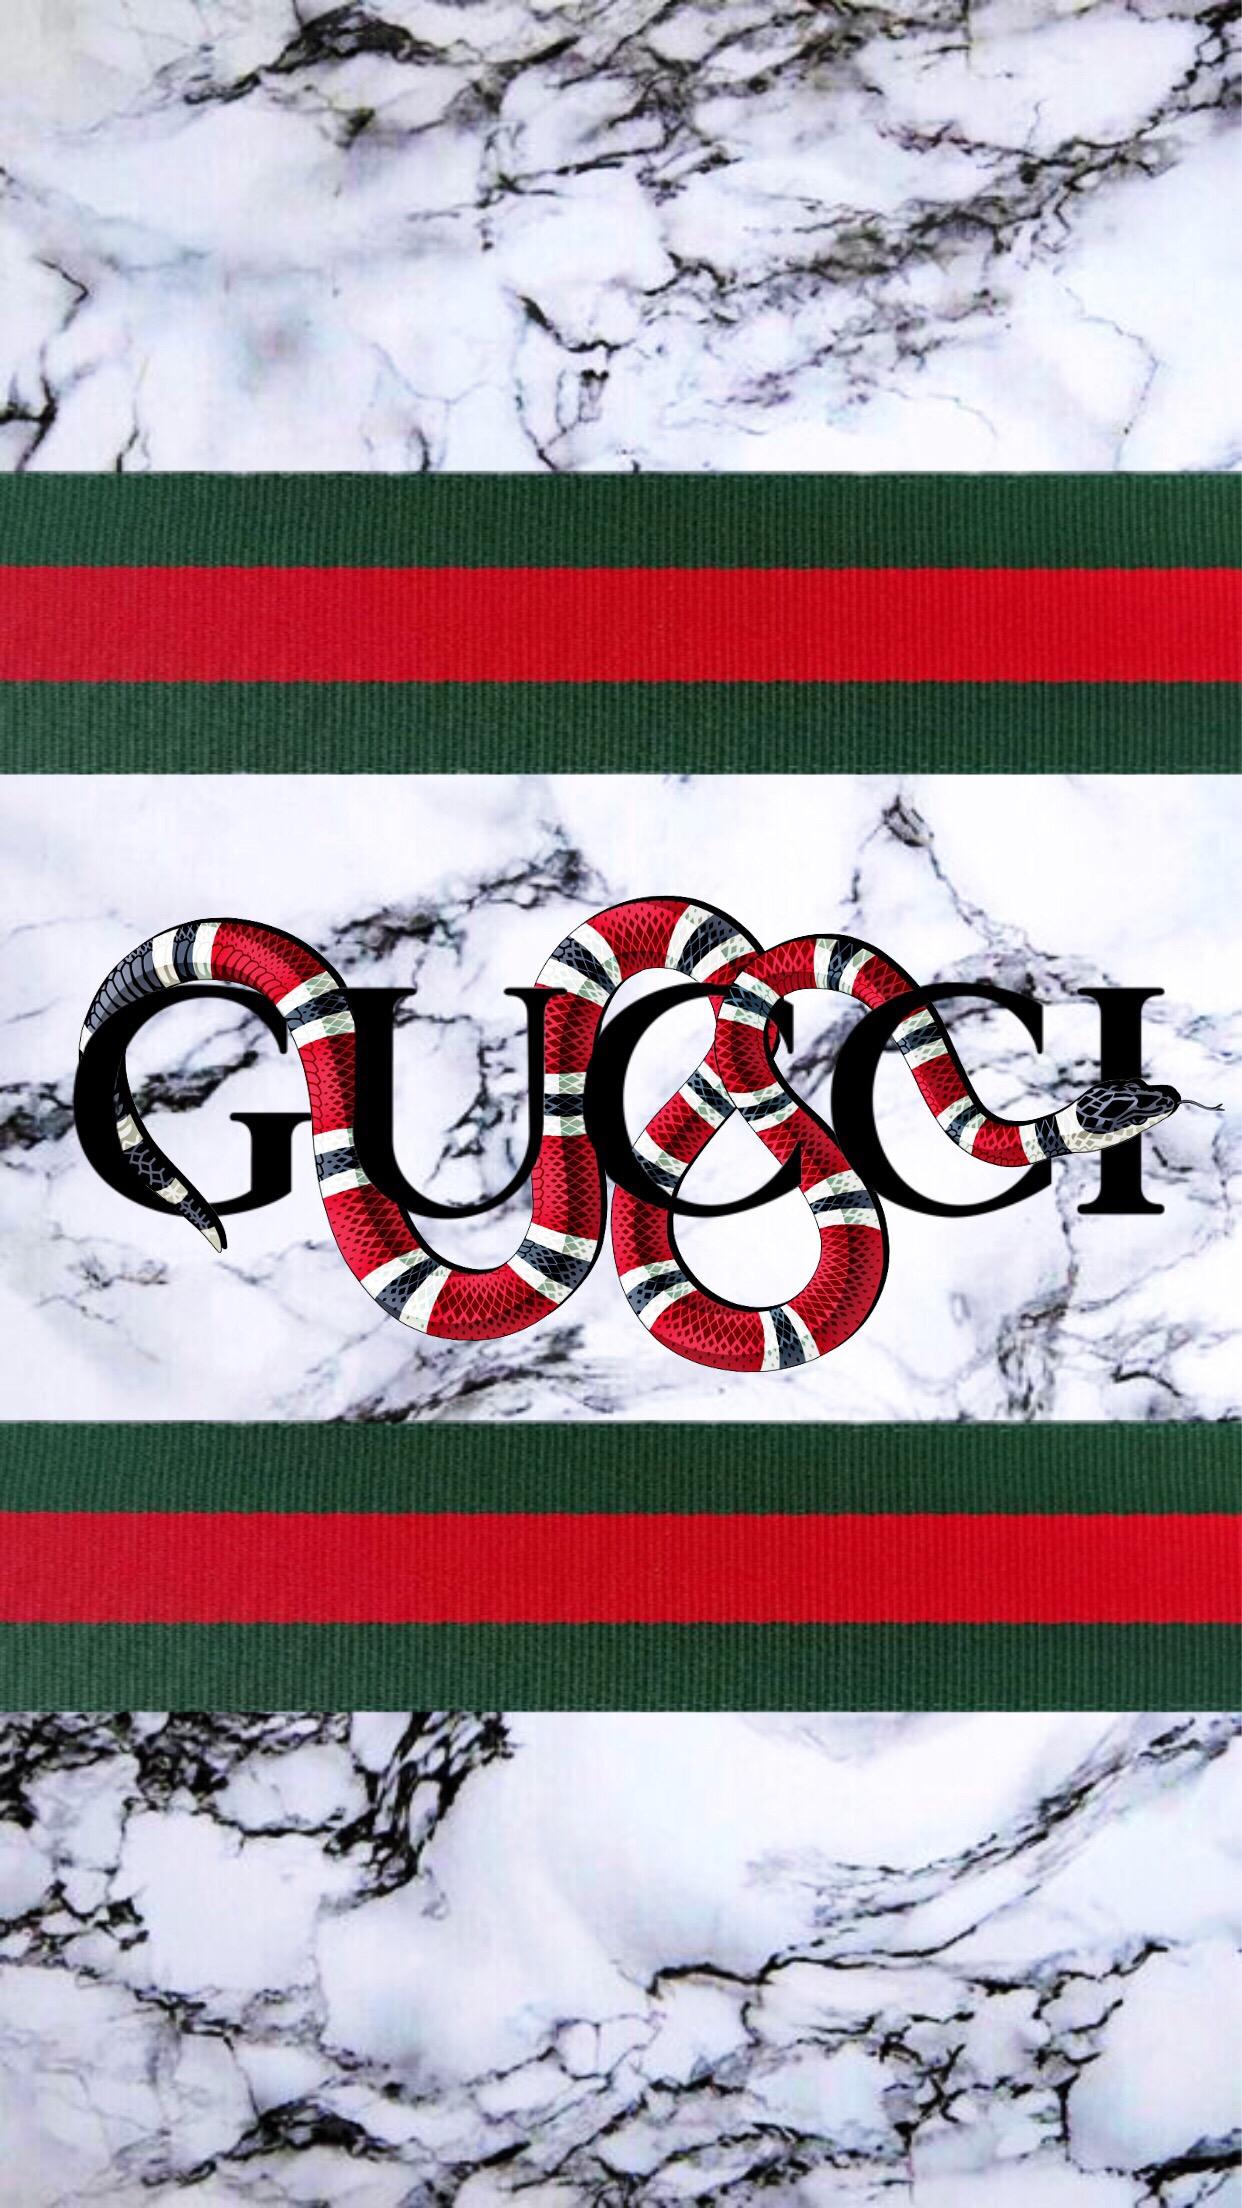 Bts Cute Wallpaper Freetoedit Gucci Wallpaper Marble Snake Hopeulikeit